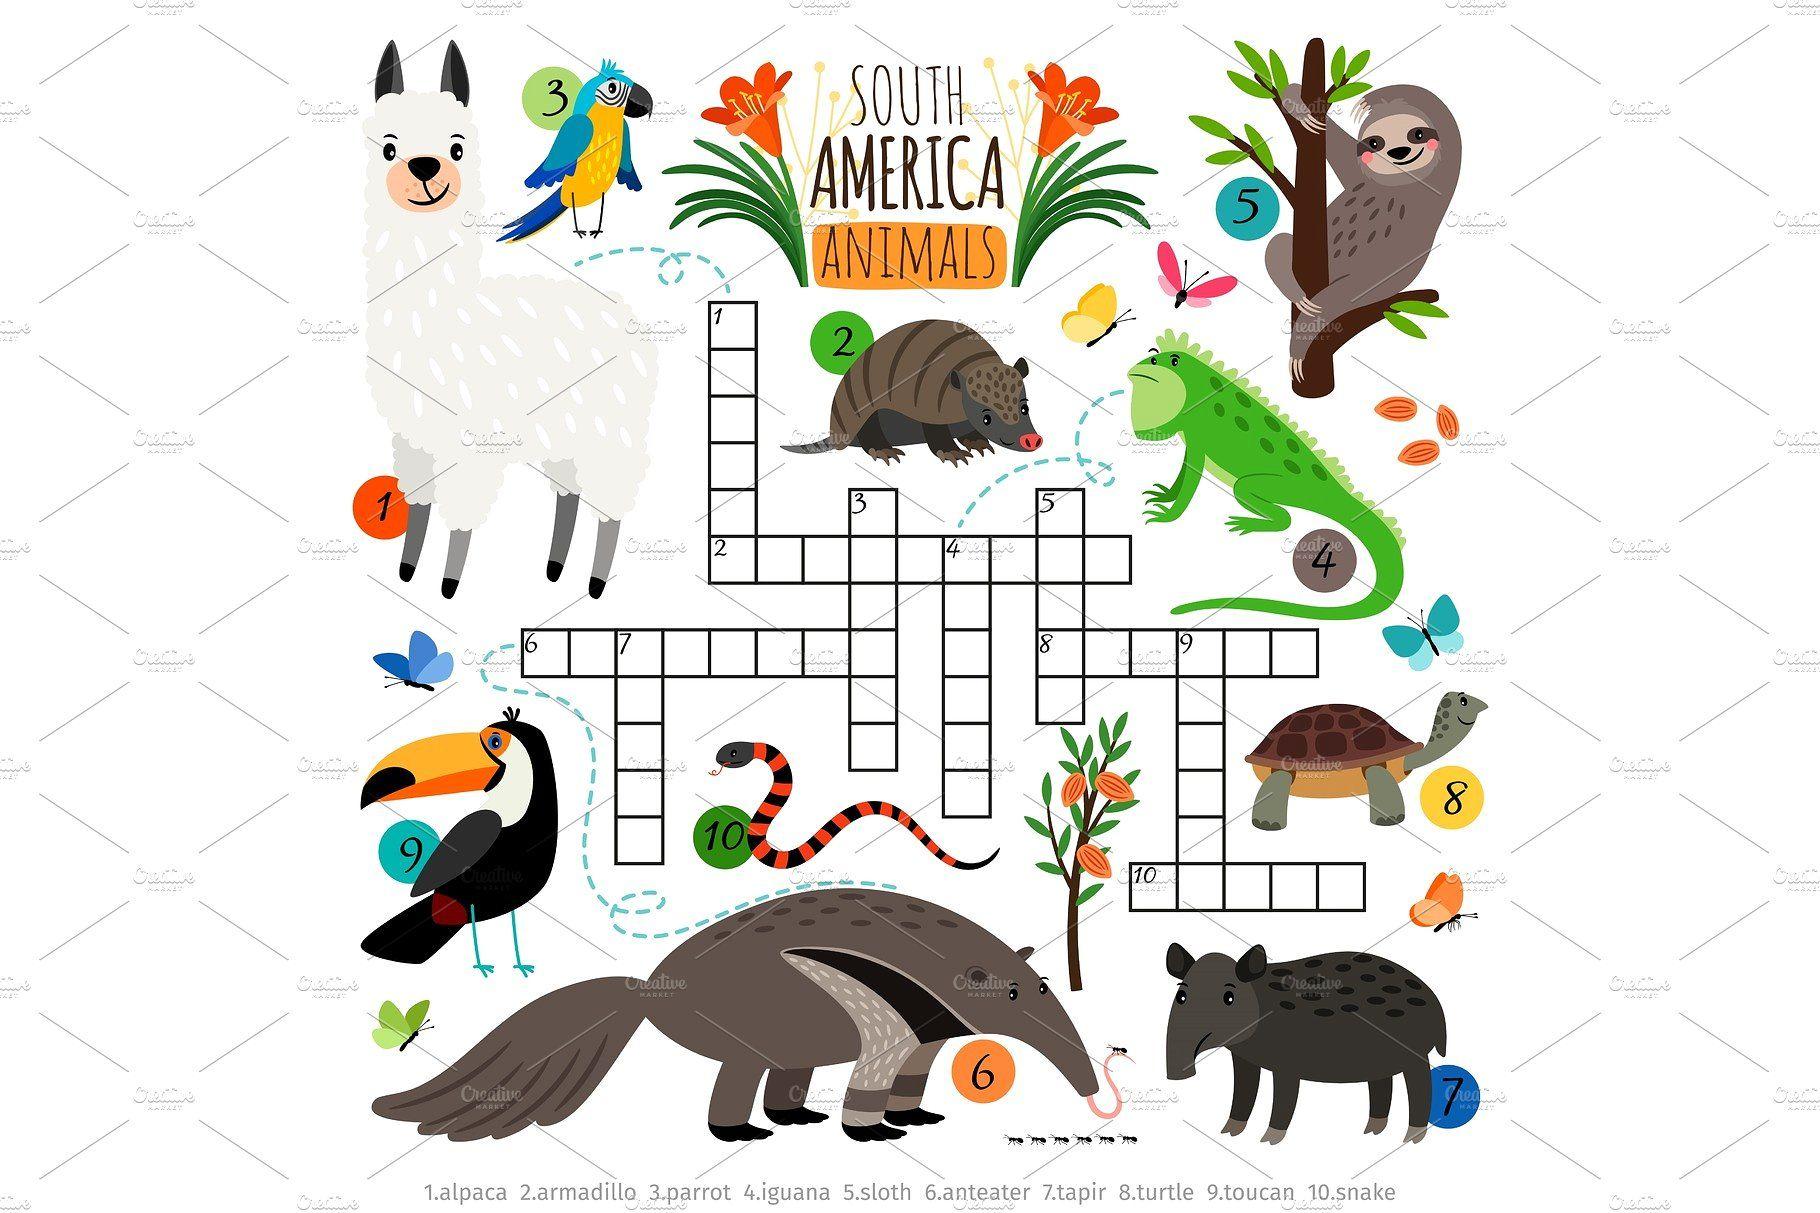 American Animals Crossword American Animals South America Animals Animals